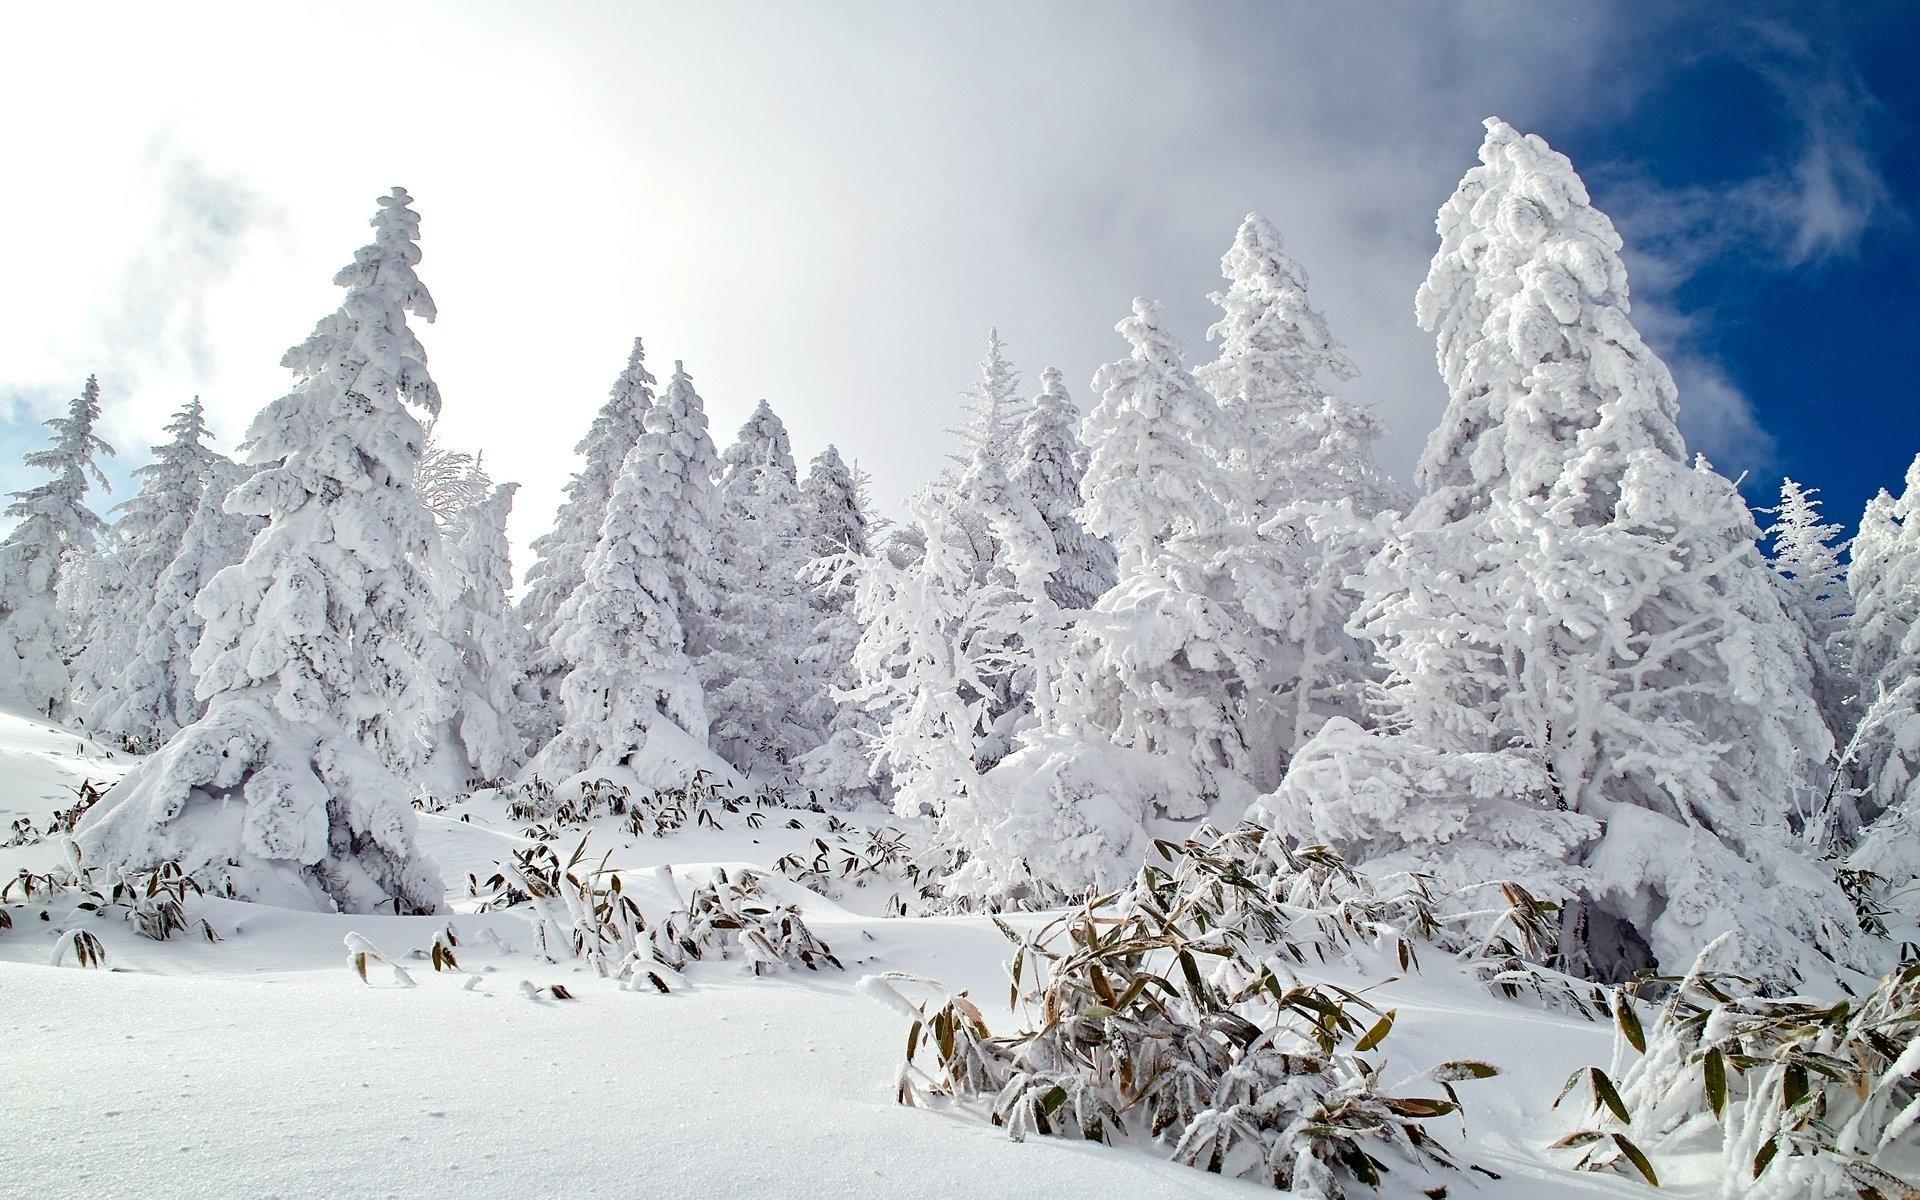 Christmas Wallpaper Snow Falling Beautiful Snow Wallpapers 183 ①